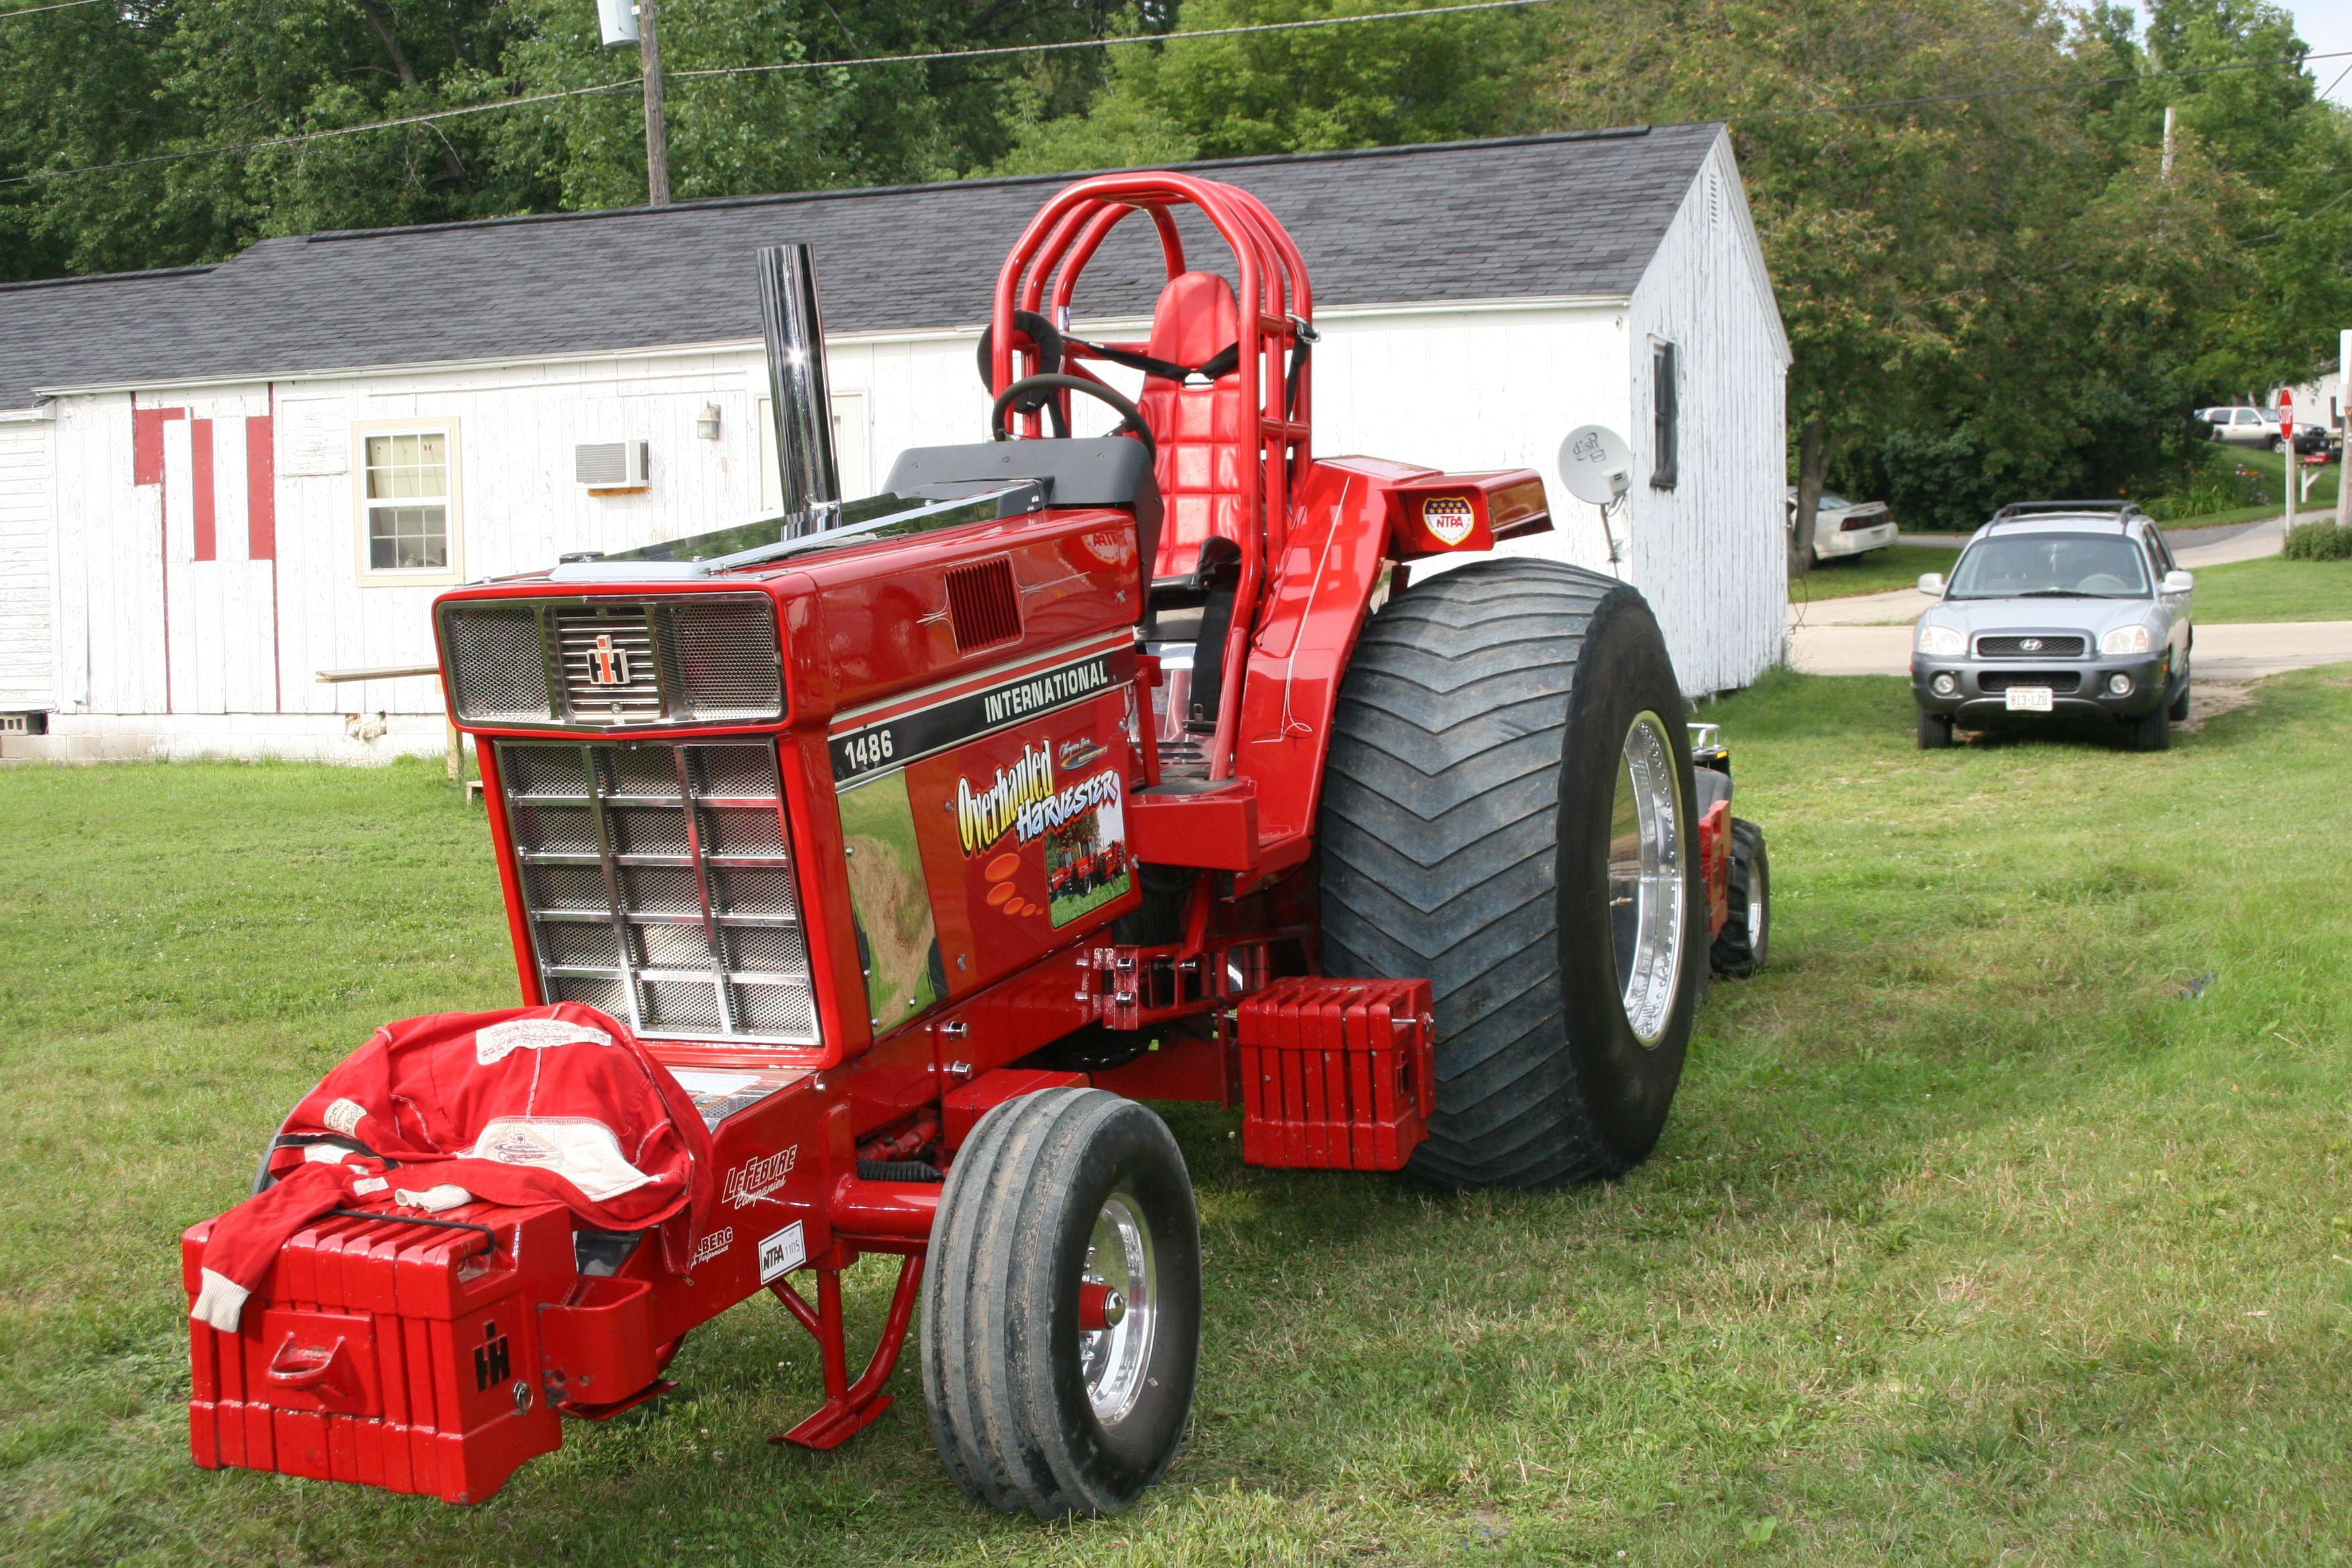 Ih Pulling Tractors : Pulling tractor international farmall pinterest